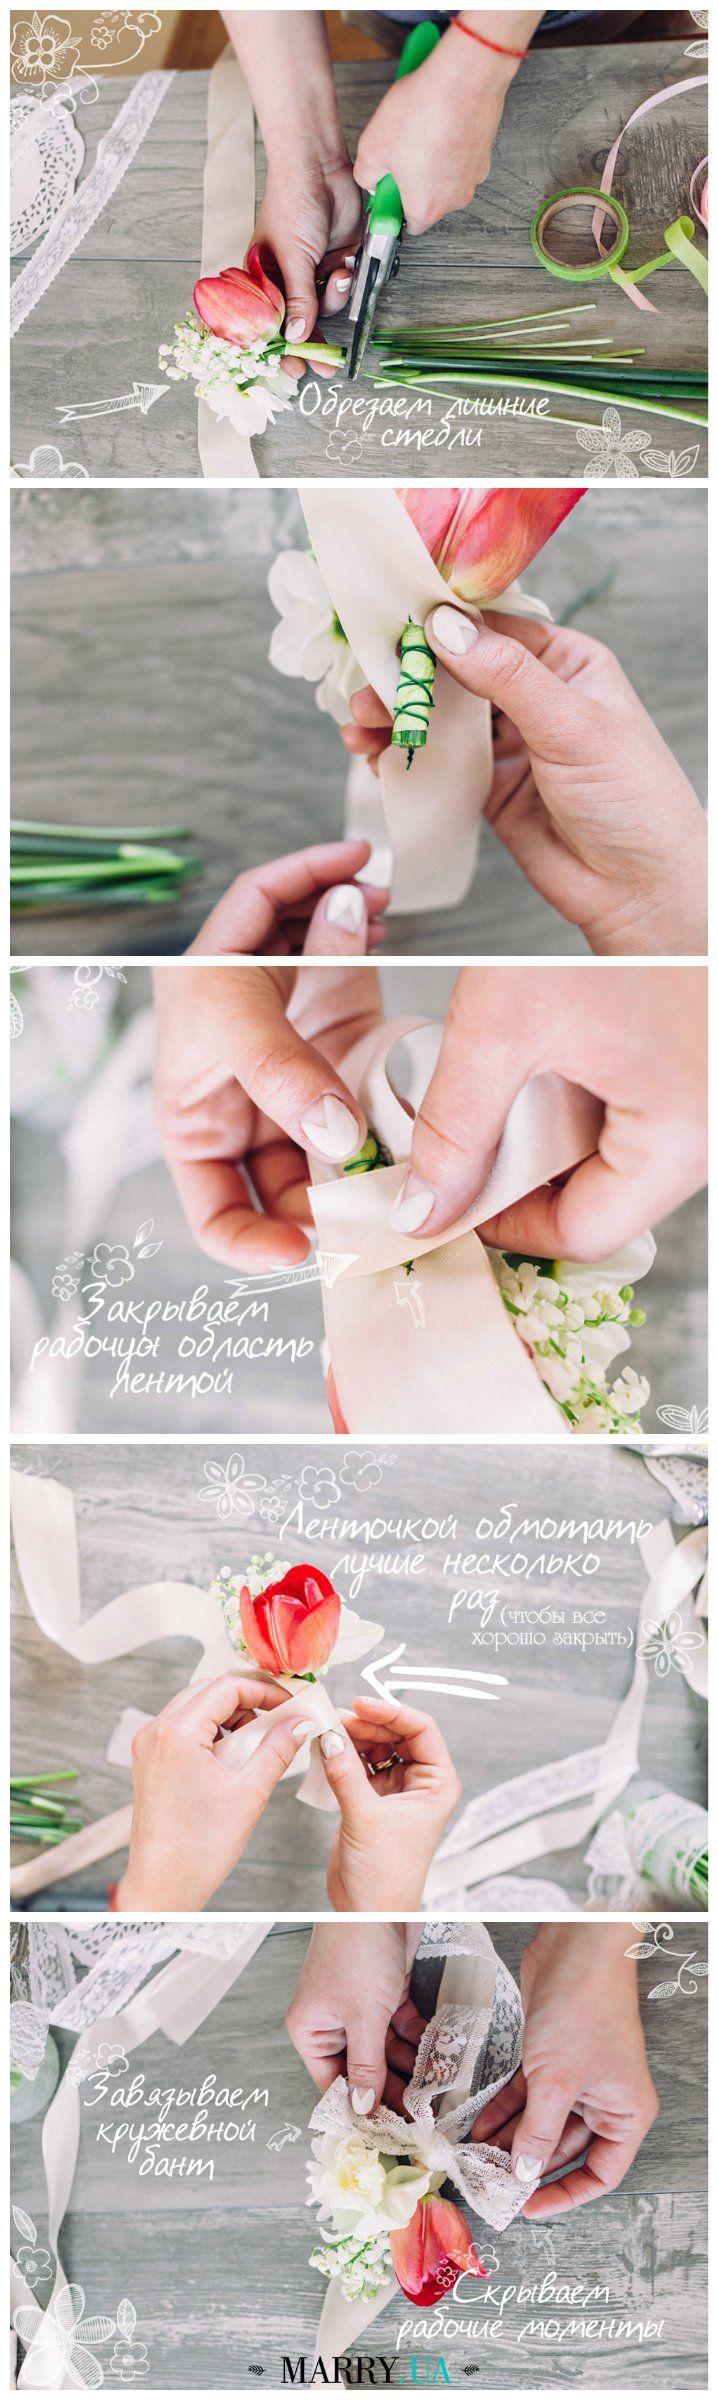 Wedding accesories for bridesmaids, flower bracelet, lace, wedding flowers DIY, handmade